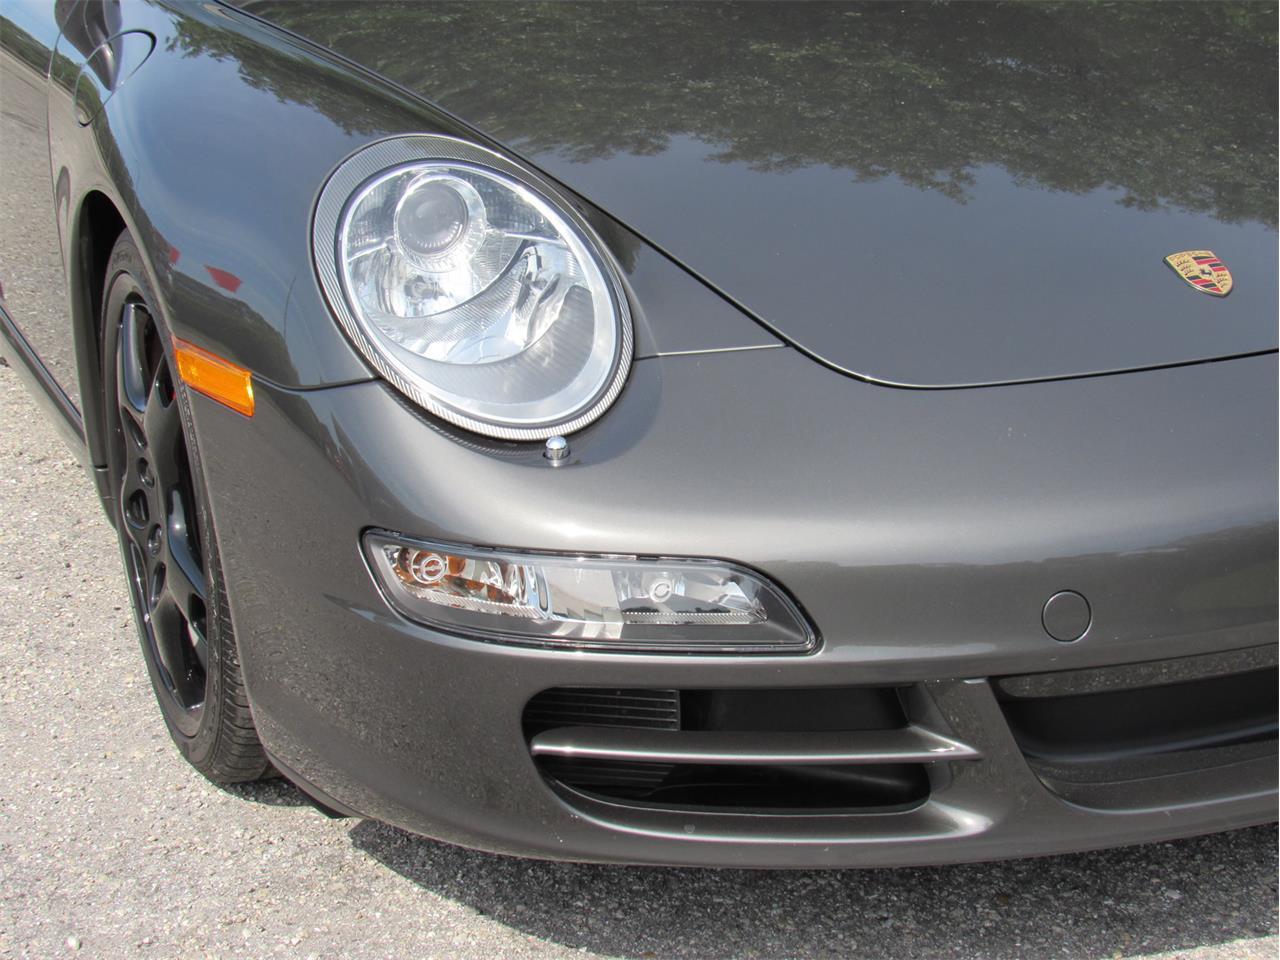 2006 Porsche 911 Carrera S (CC-1208012) for sale in Sarasota, Florida